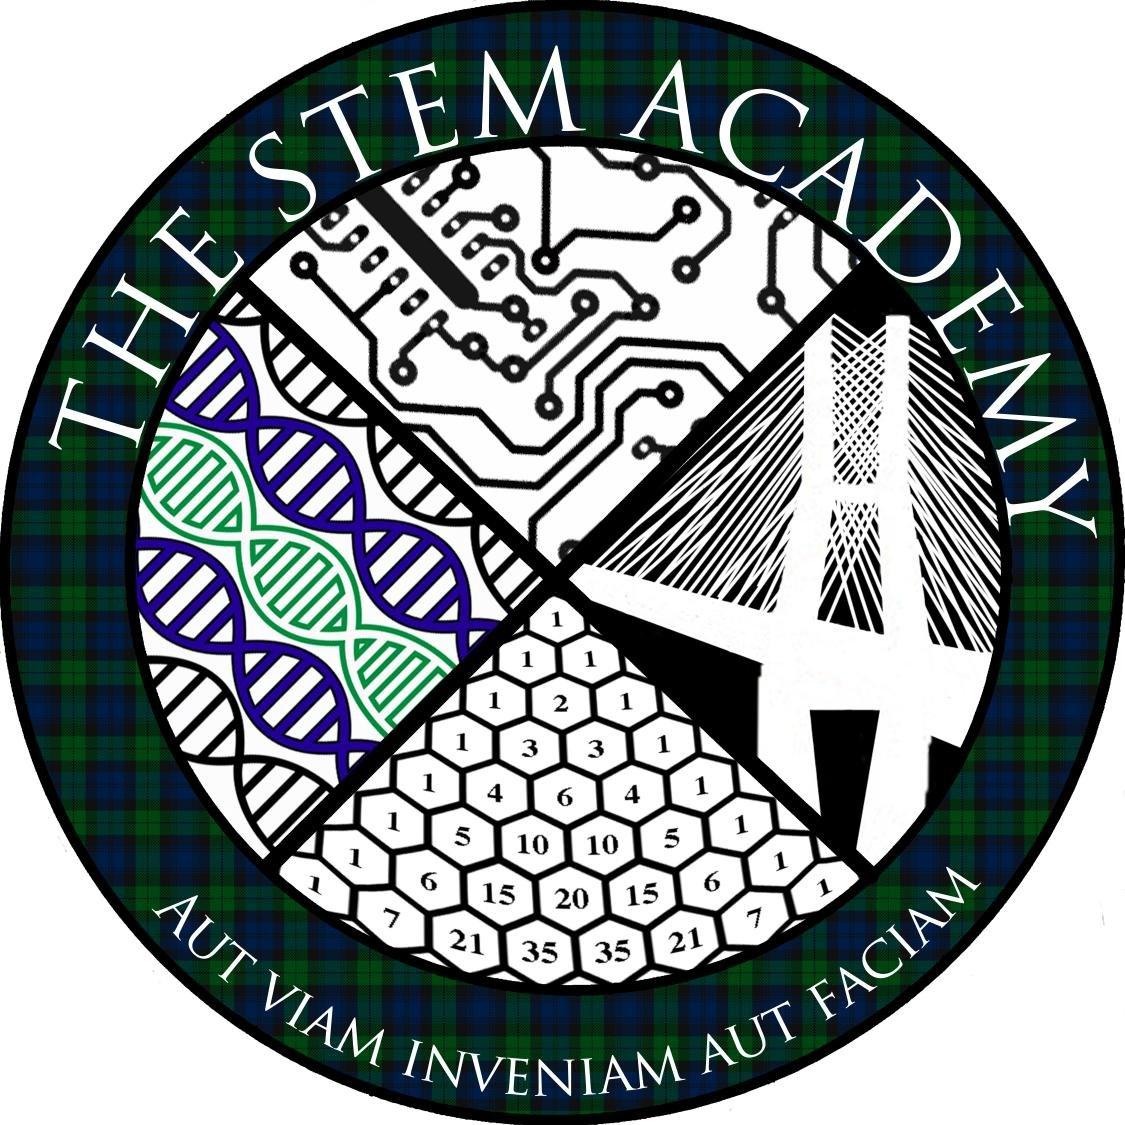 The_STEM_Academy (@The_STEM_Academ)